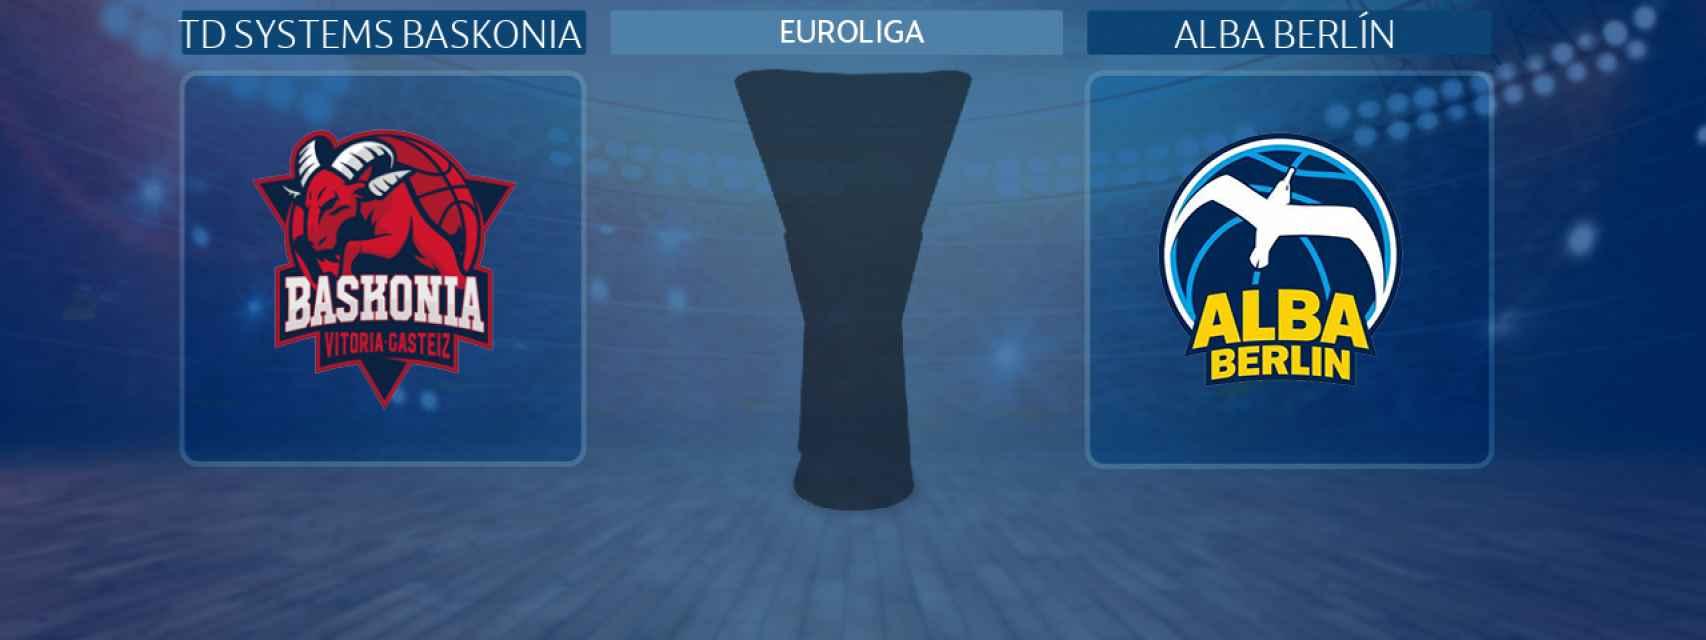 TD Systems Baskonia - Alba Berlín, partido de la Euroliga